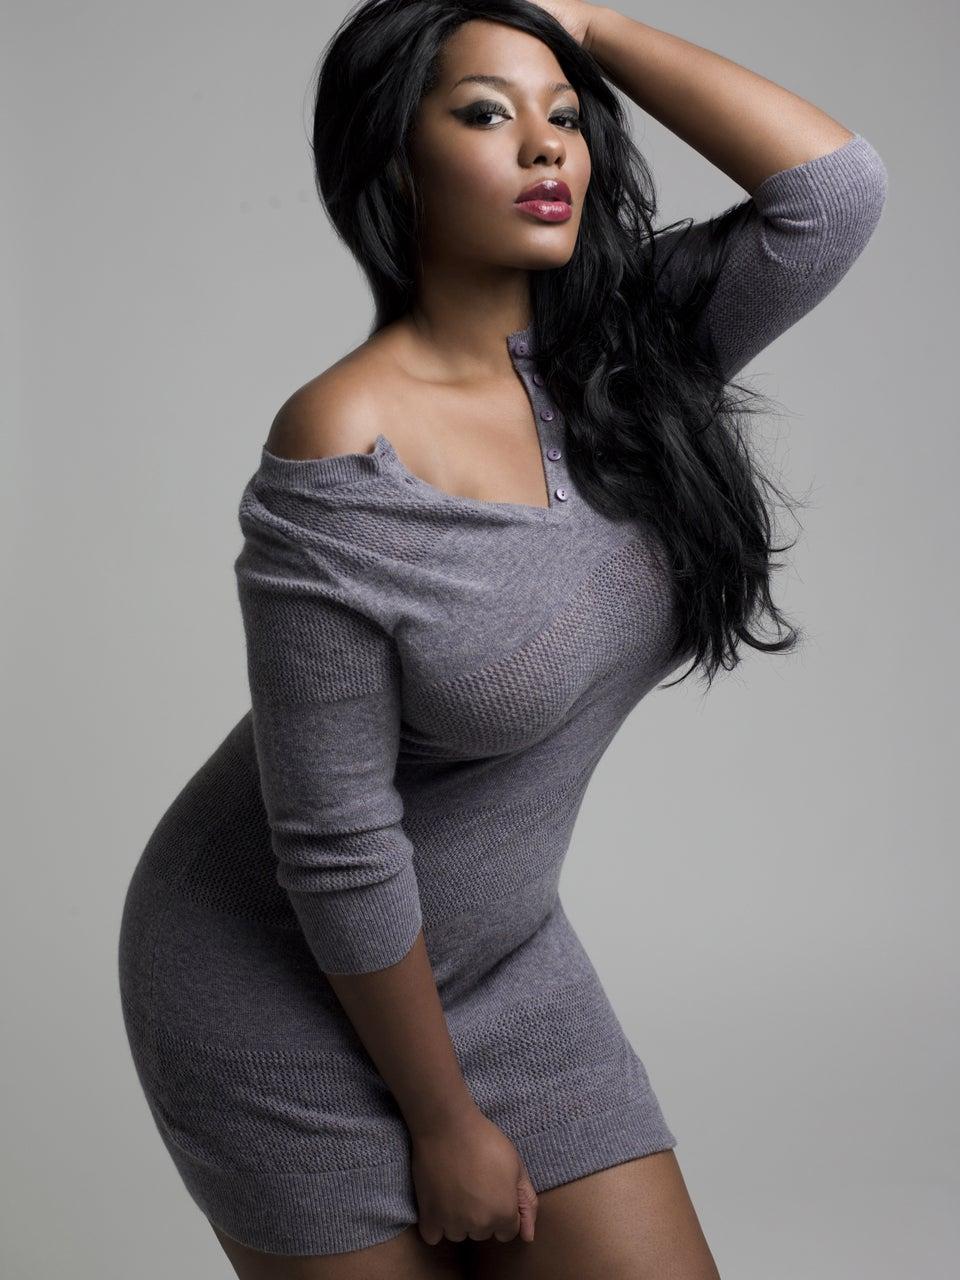 Curvy Model of the Month: Joanne Borgella